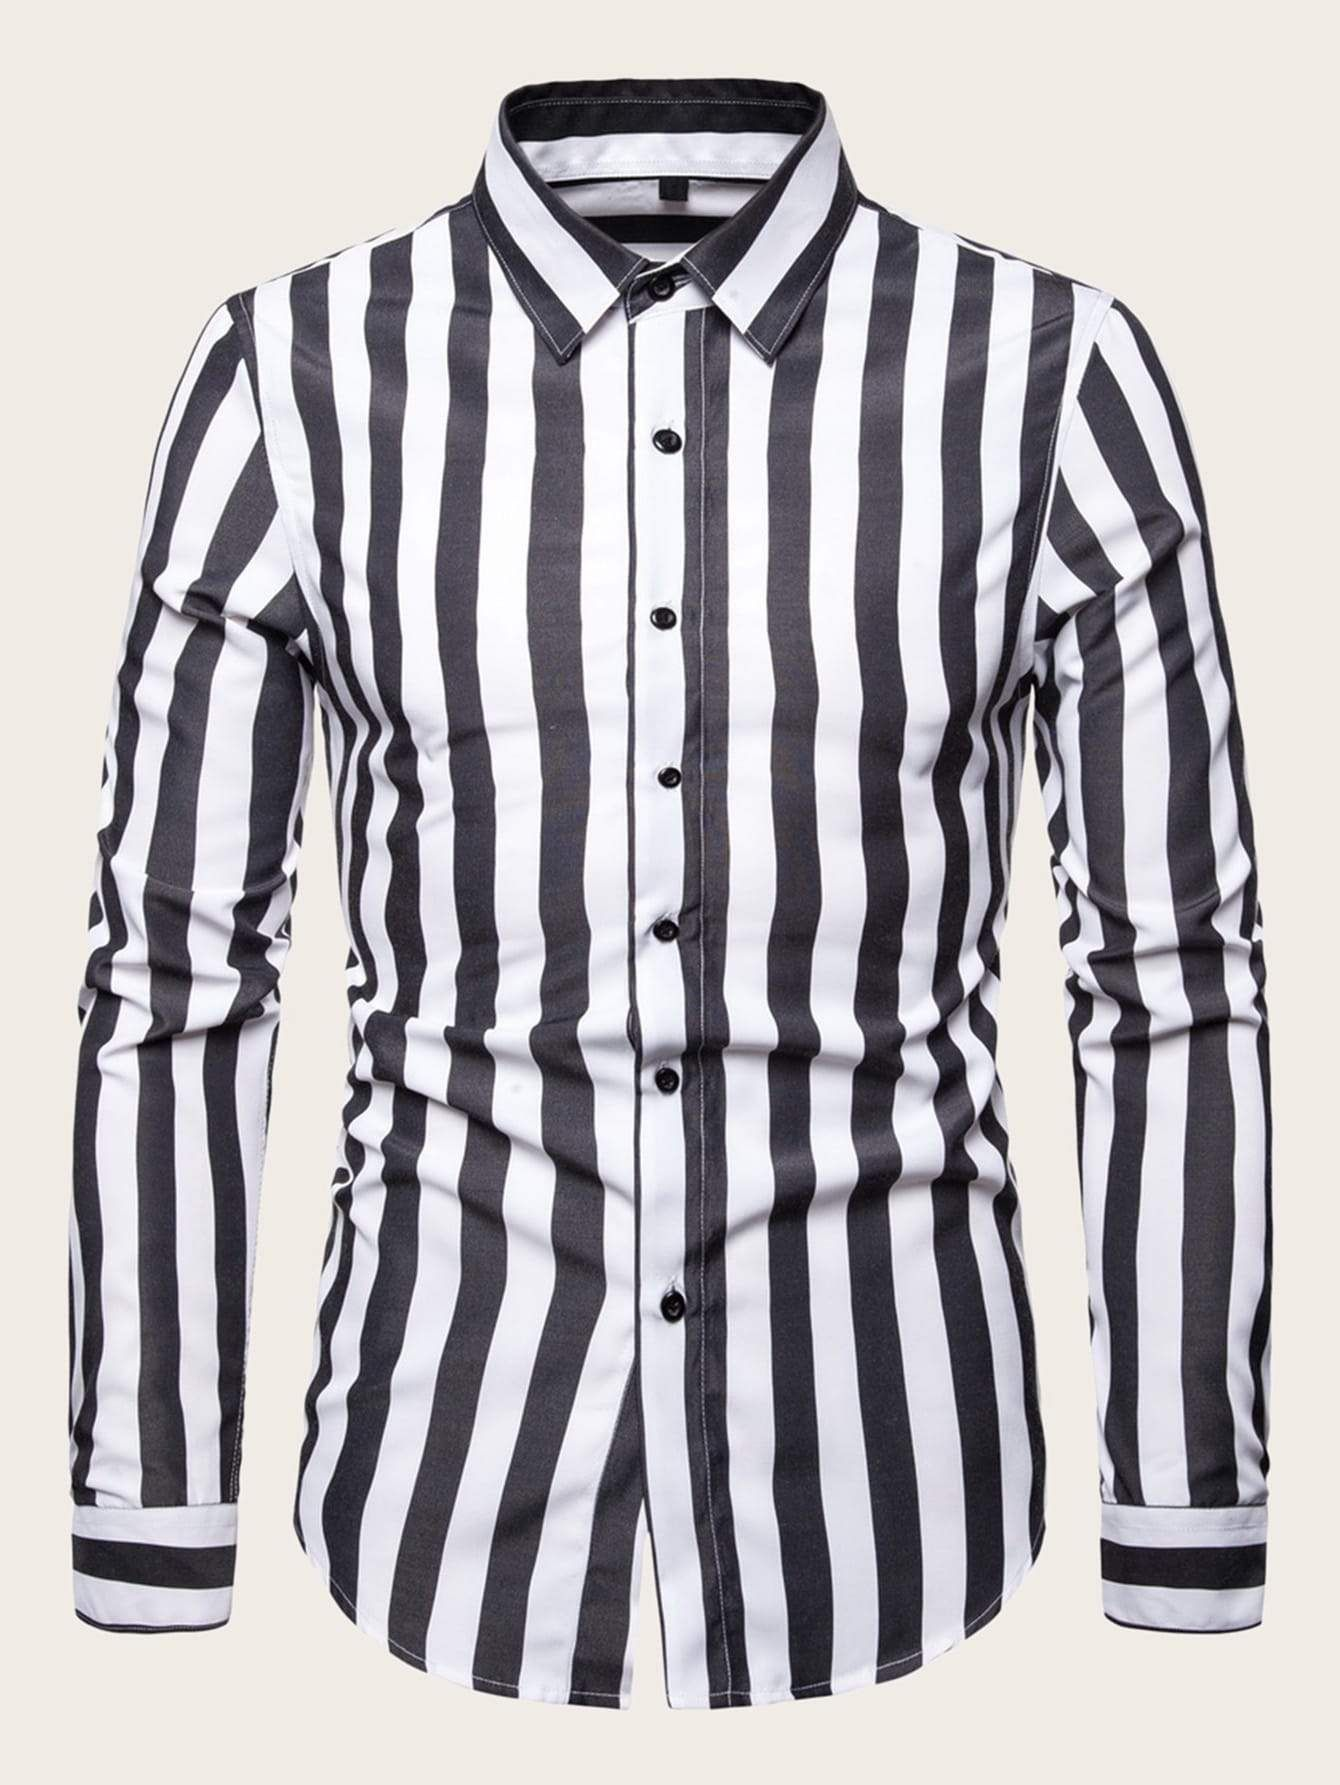 Men Black & White Vertical-Striped Shirt | Vertical ...